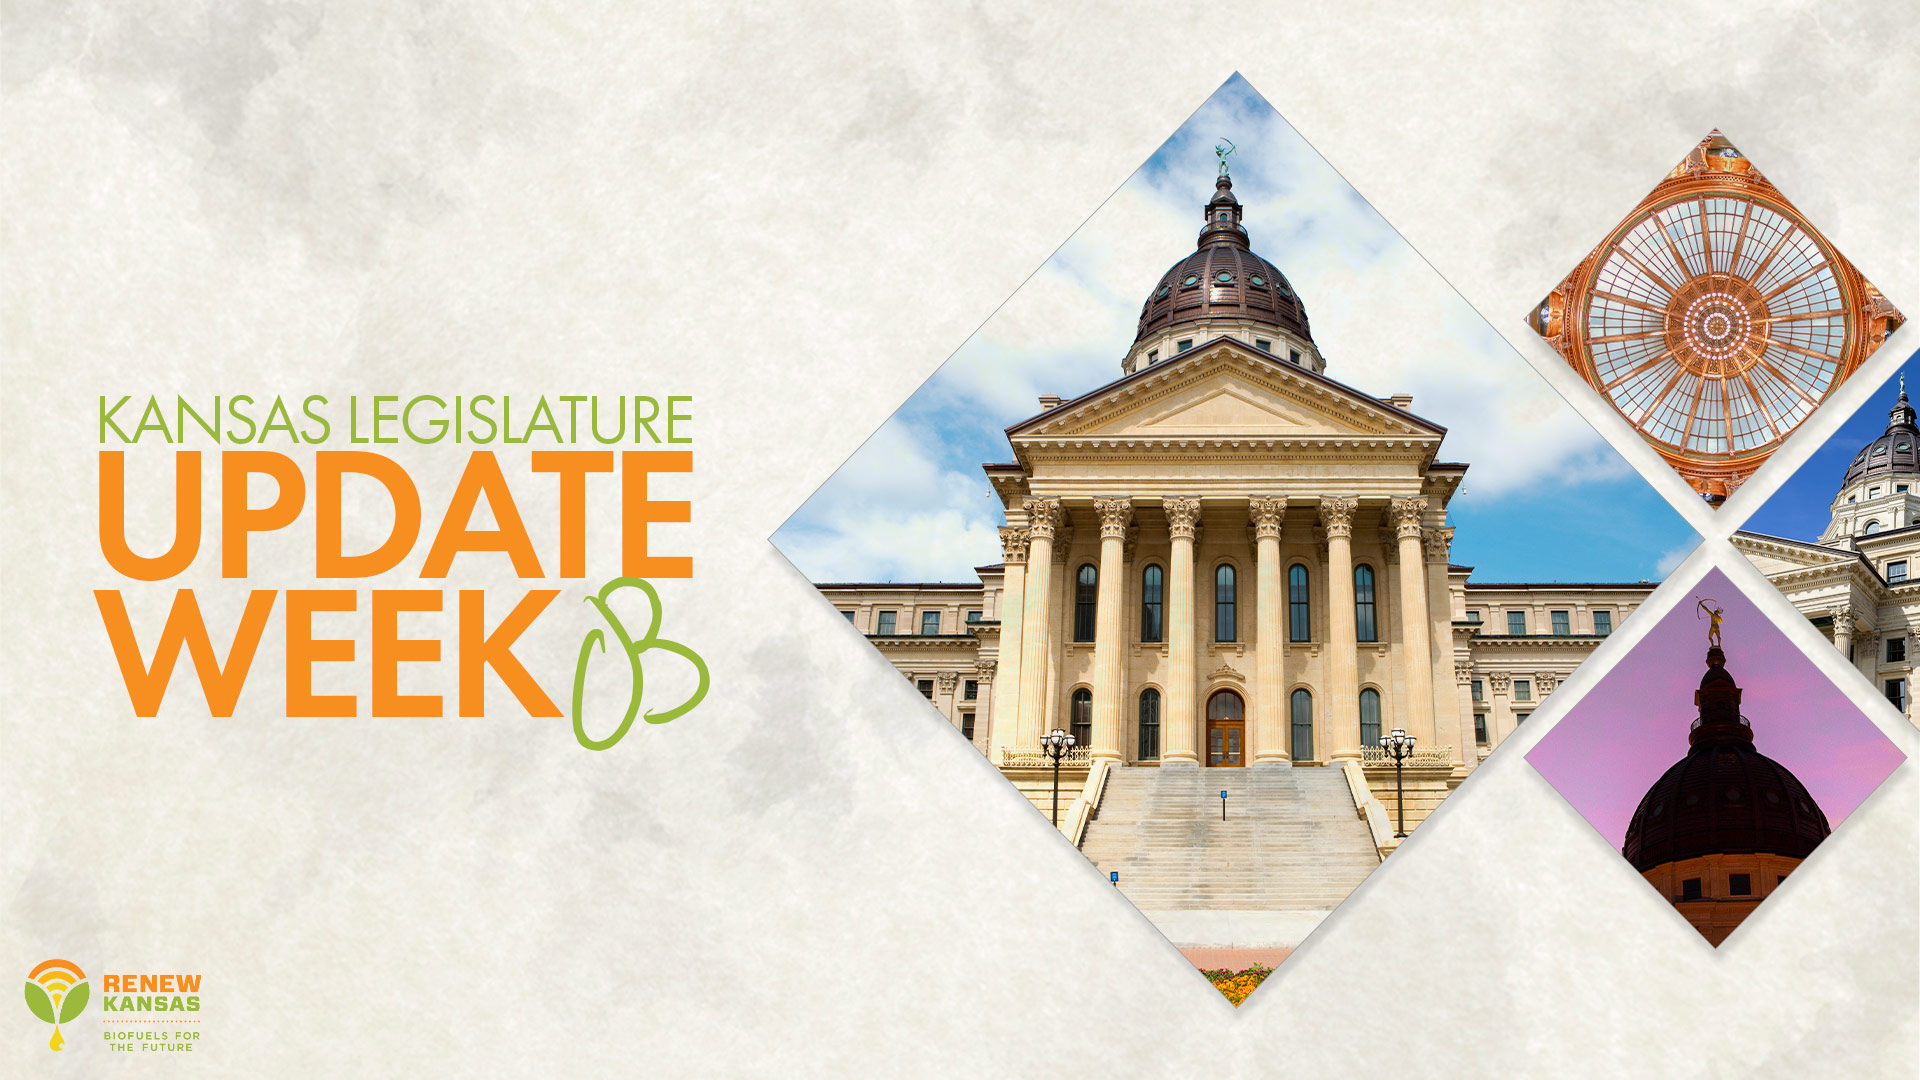 Kansas Legislature Update Week Three